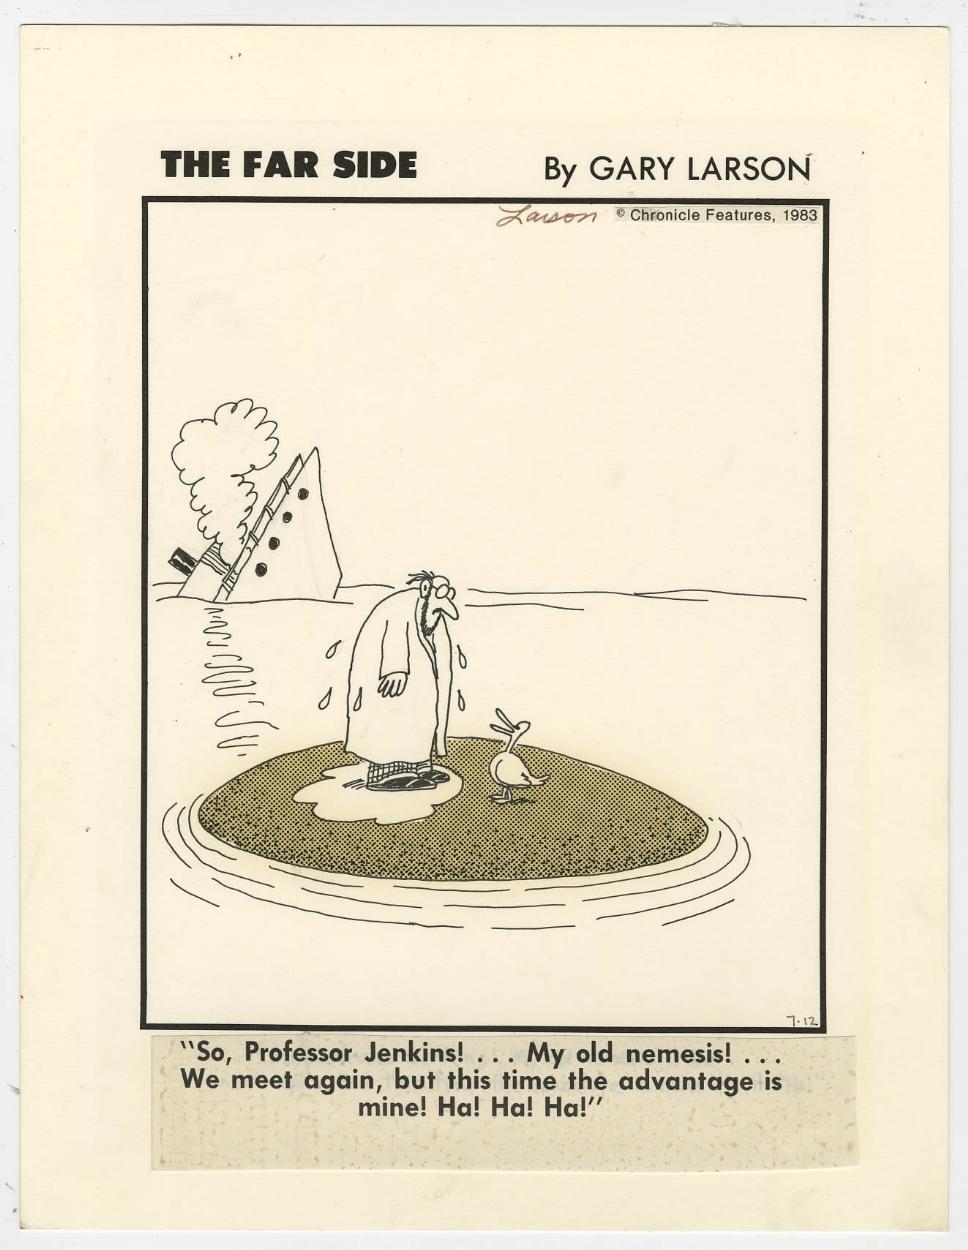 far side cartoon 1983 gary larson in original art. Black Bedroom Furniture Sets. Home Design Ideas